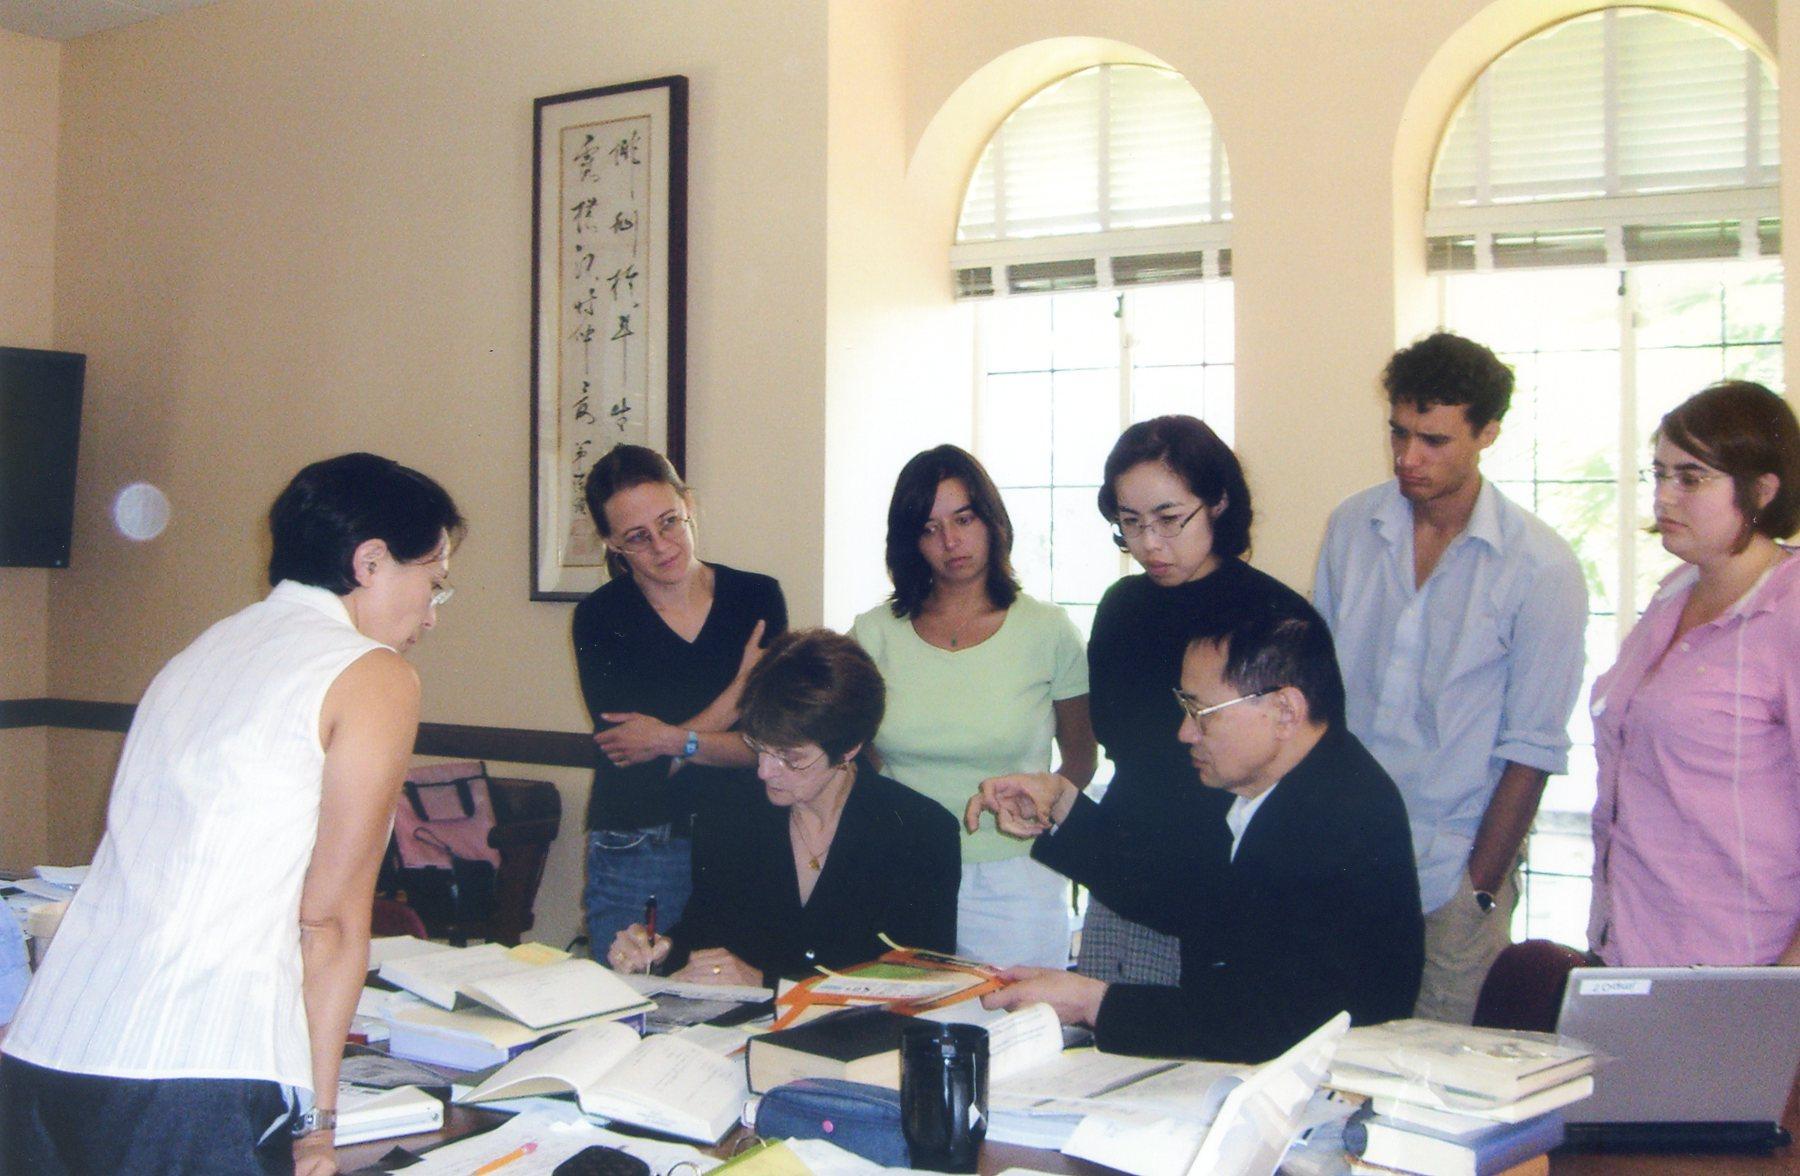 Dr. JoanPiggott reviews classical Japanese materials with Professor Eiichi Ishigami at the 2007 Kambun Workshop.